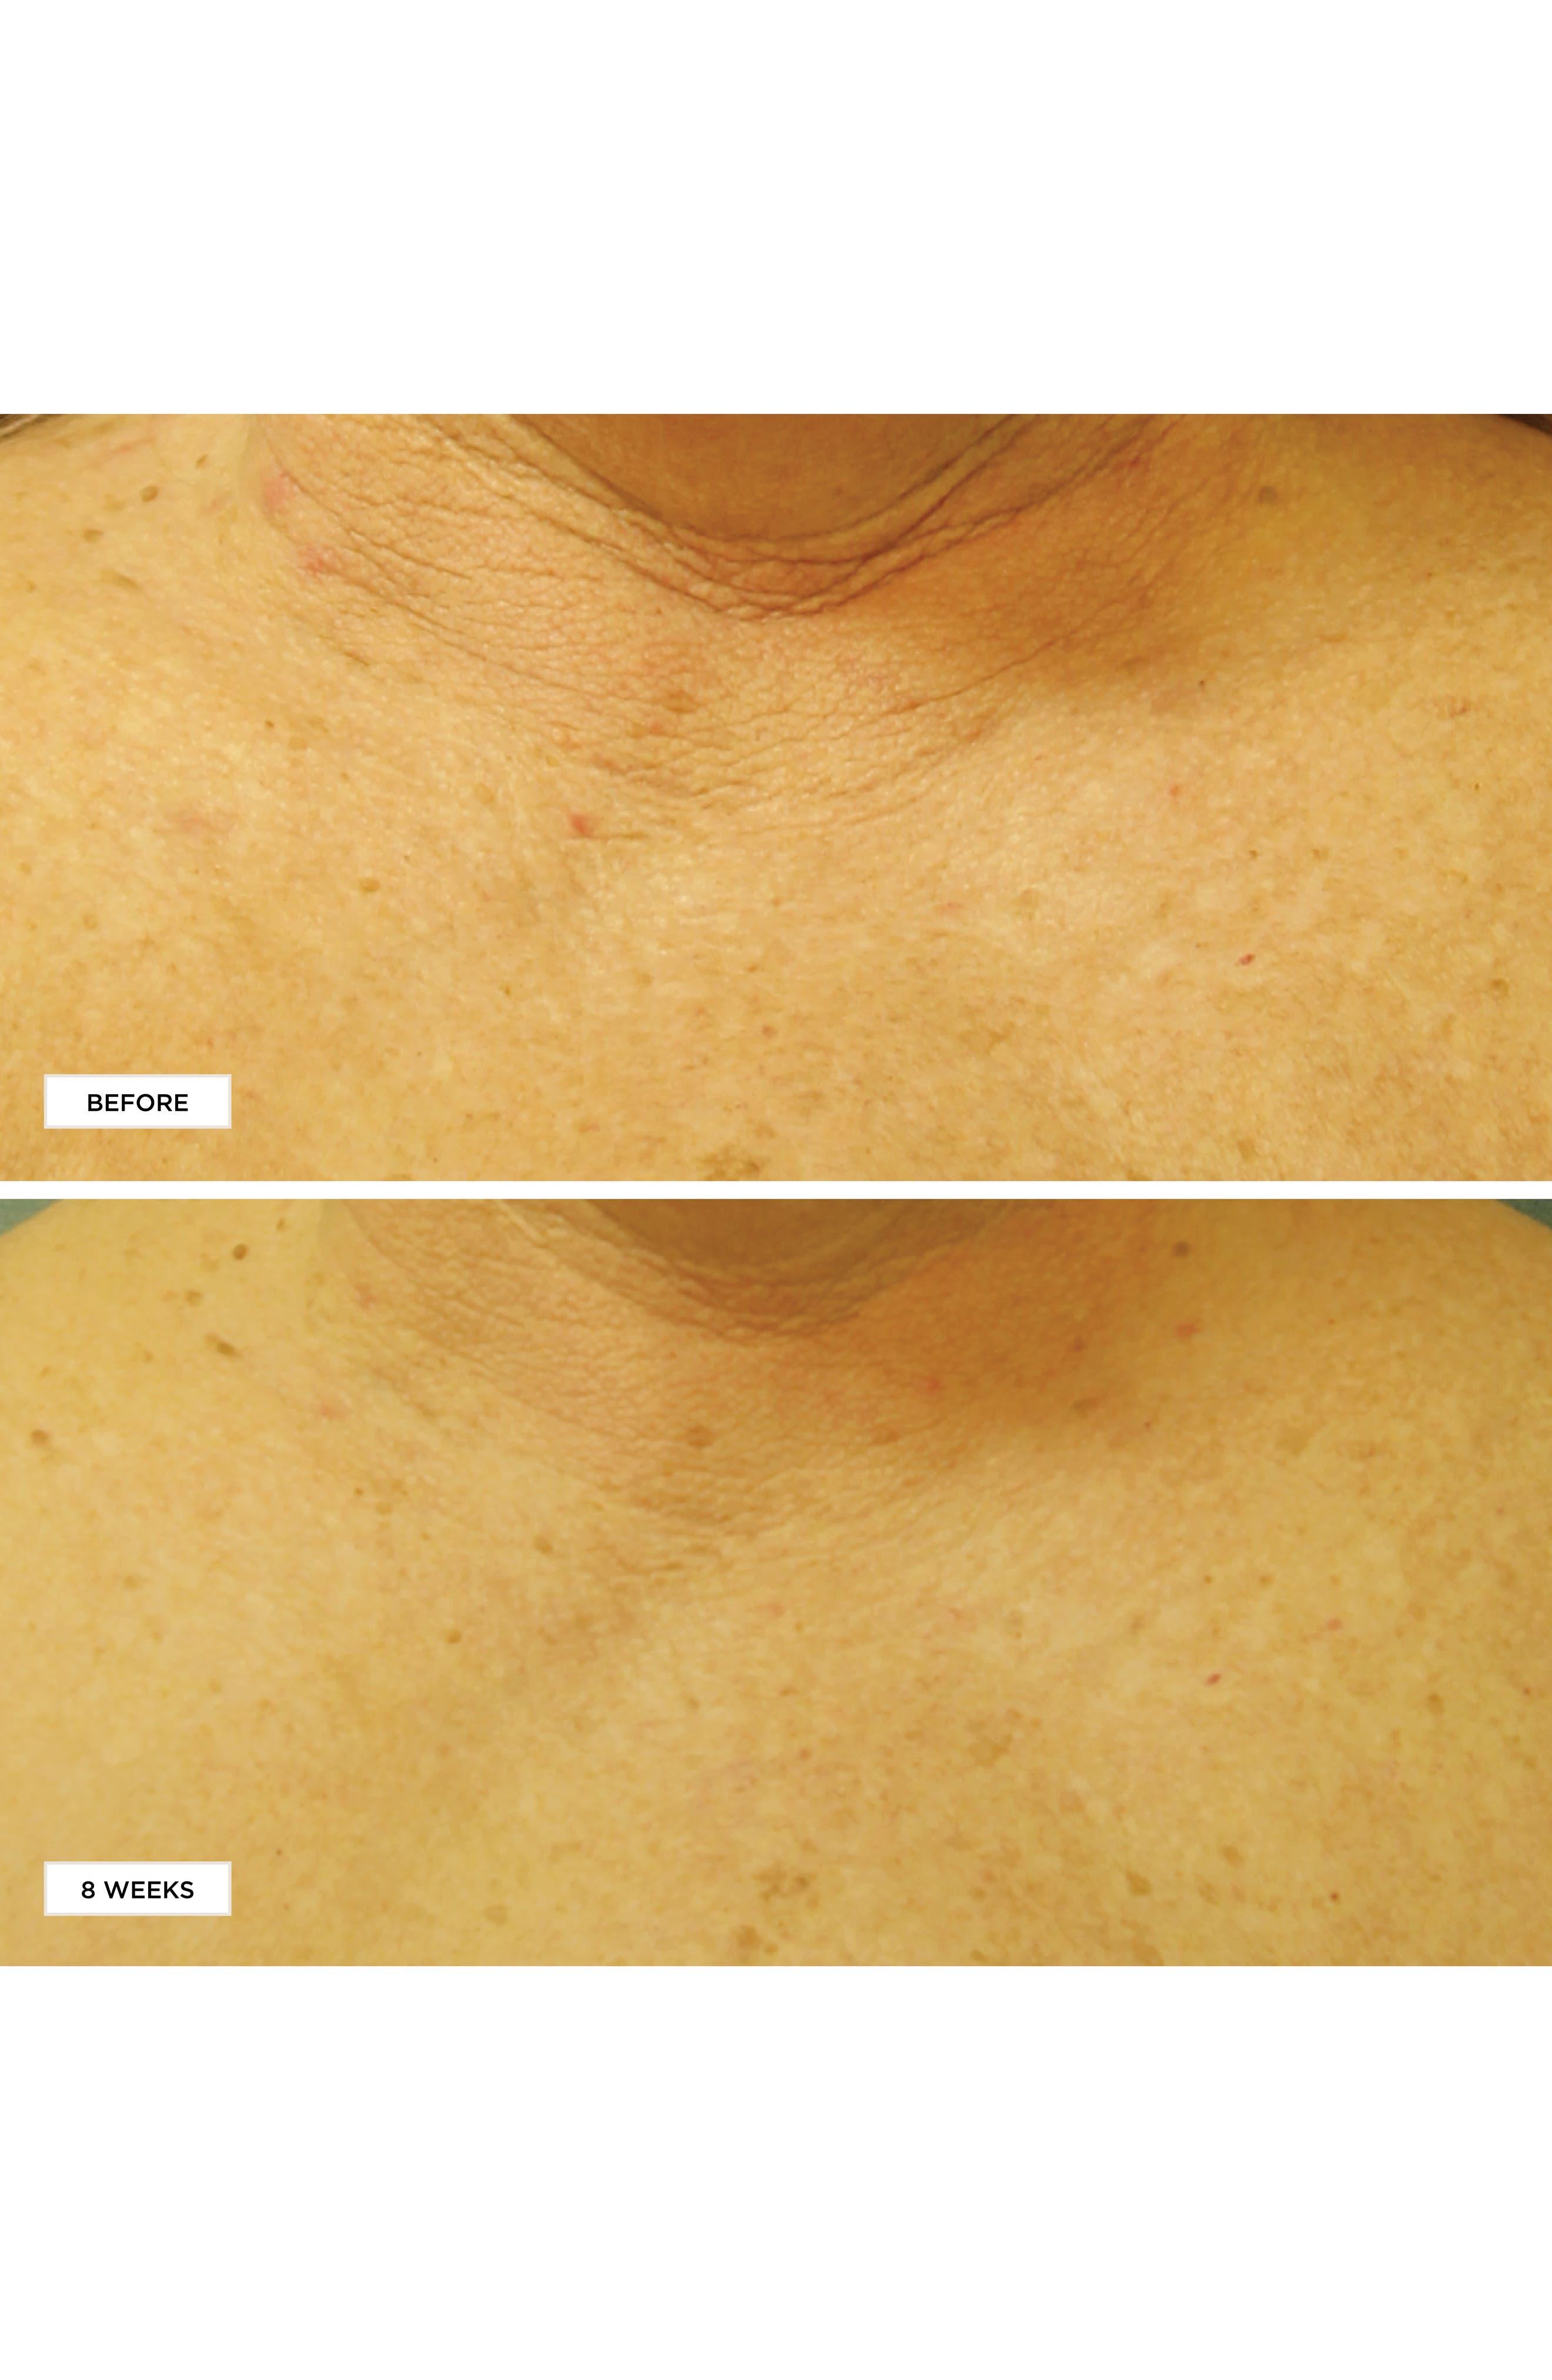 Neuropeptide Restorative Neck & Chest Therapy SPF 25,                             Alternate thumbnail 2, color,                             No Color